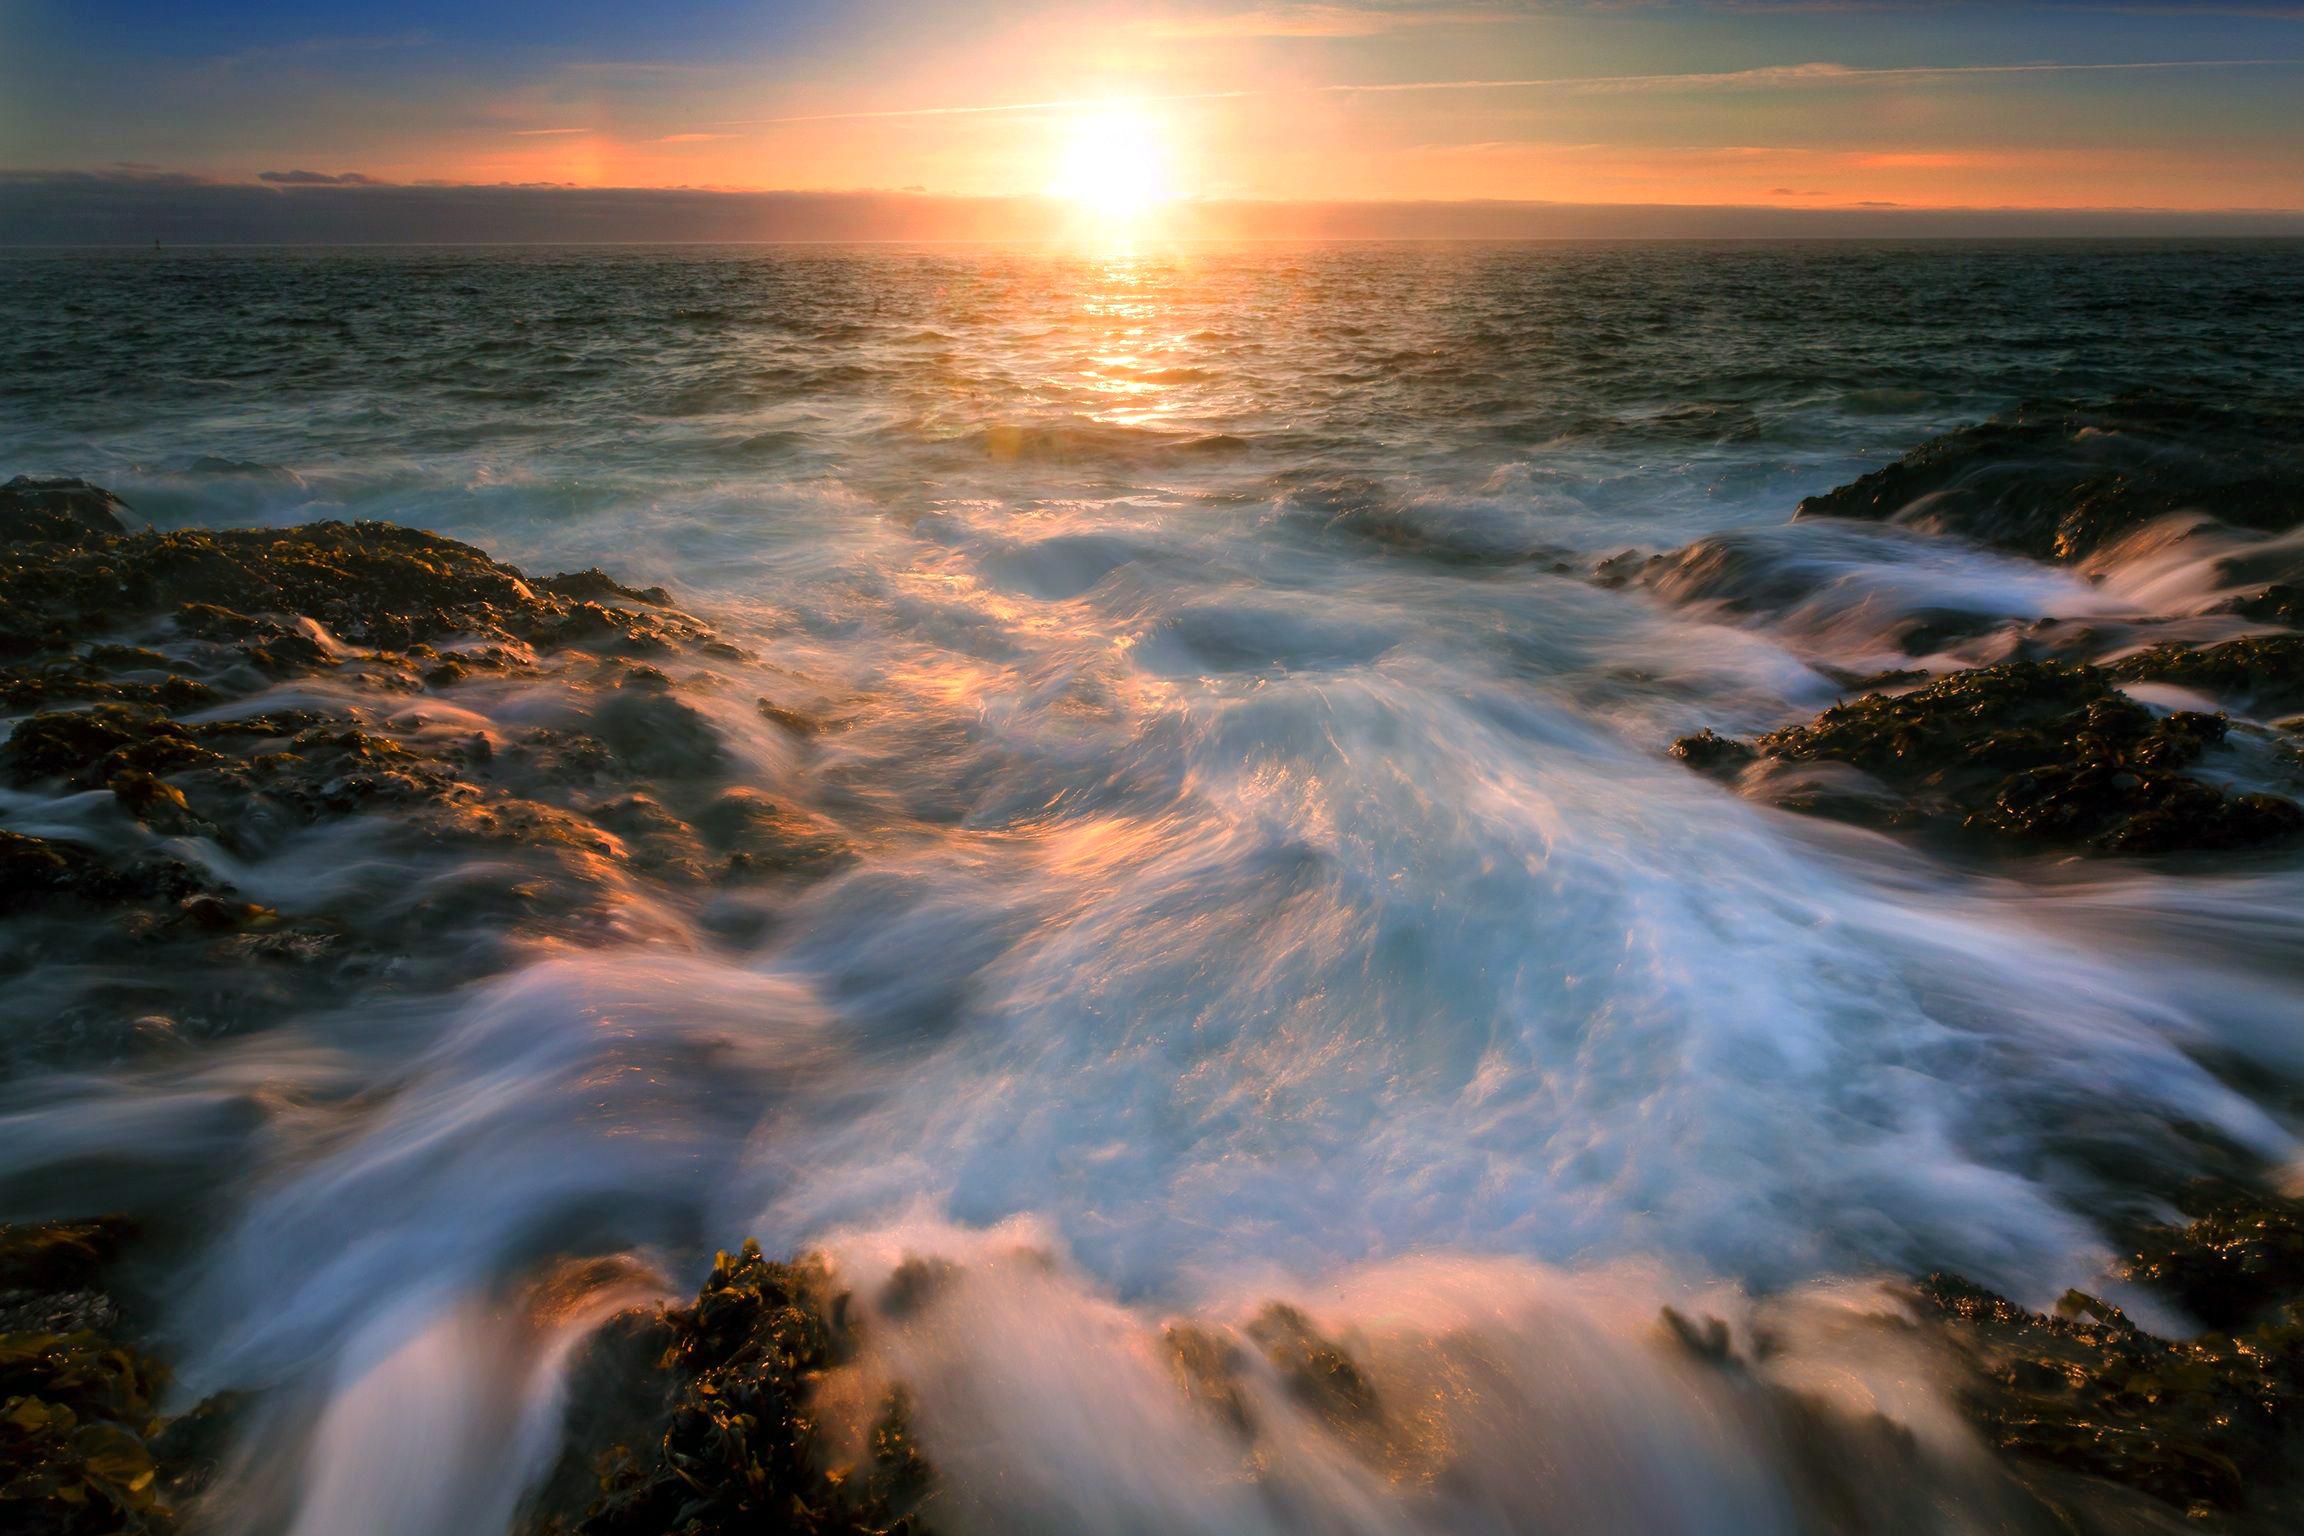 Картинки закат и море на телефон, картинки приколами любовные